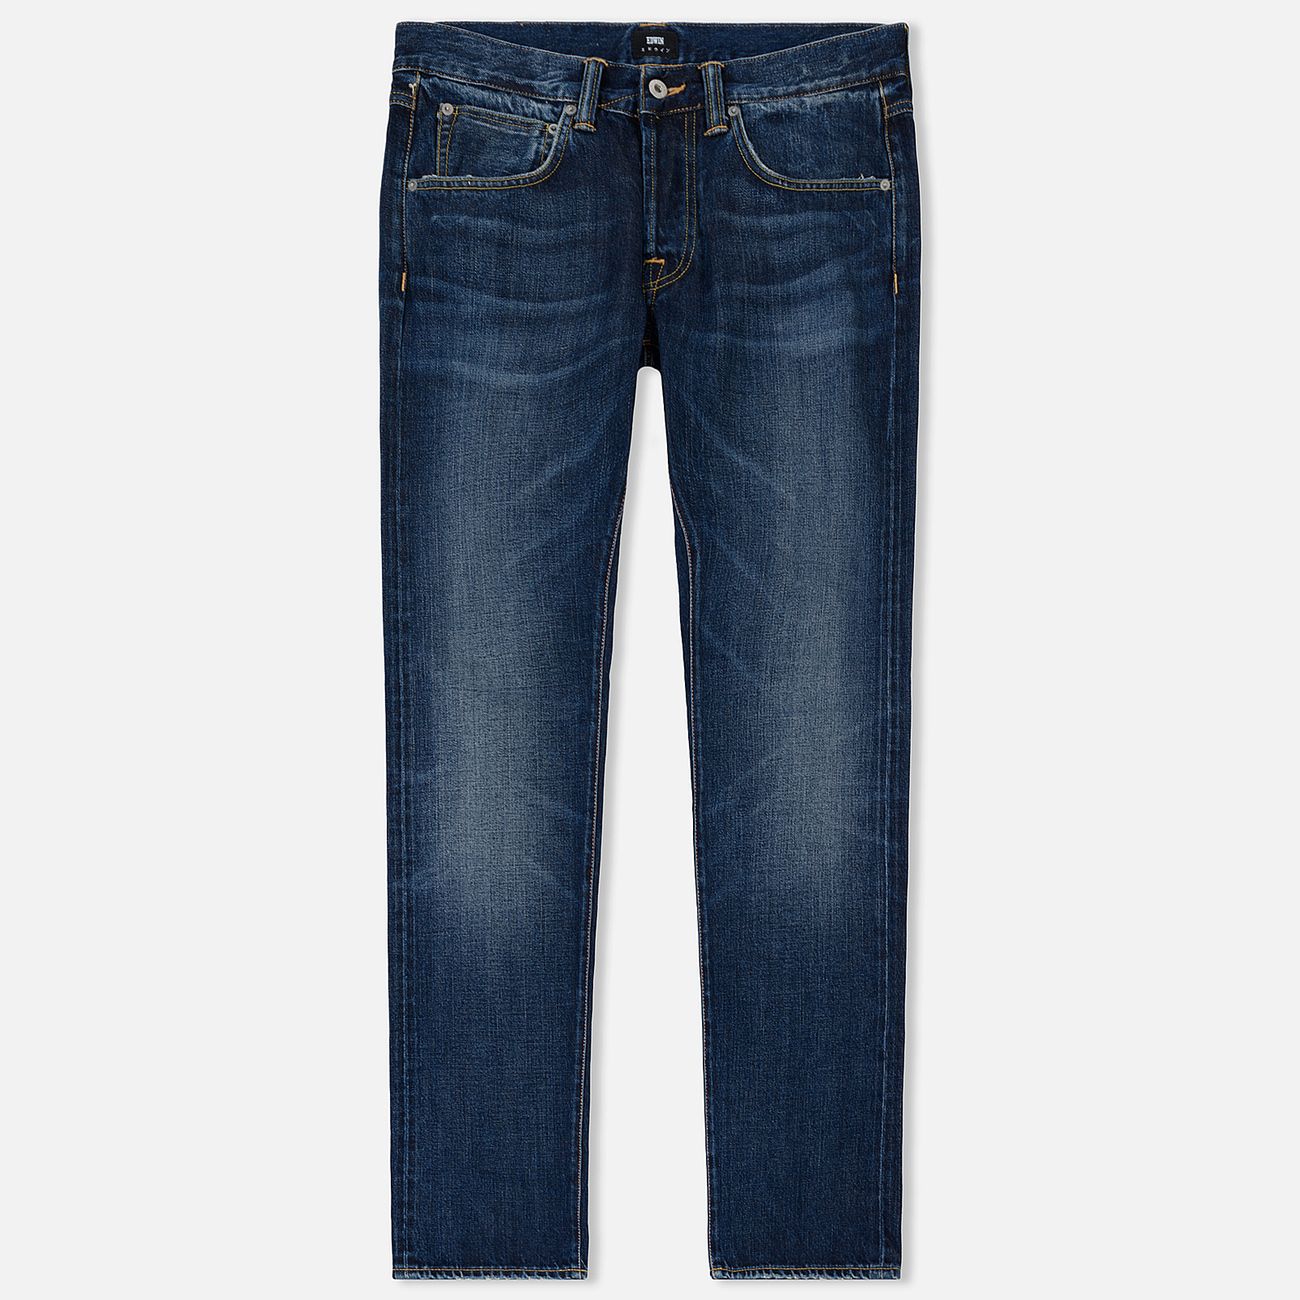 Мужские джинсы Edwin ED-55 63 Rainbow Selvage Denim 12.8 Oz Blue Hiraku Wash